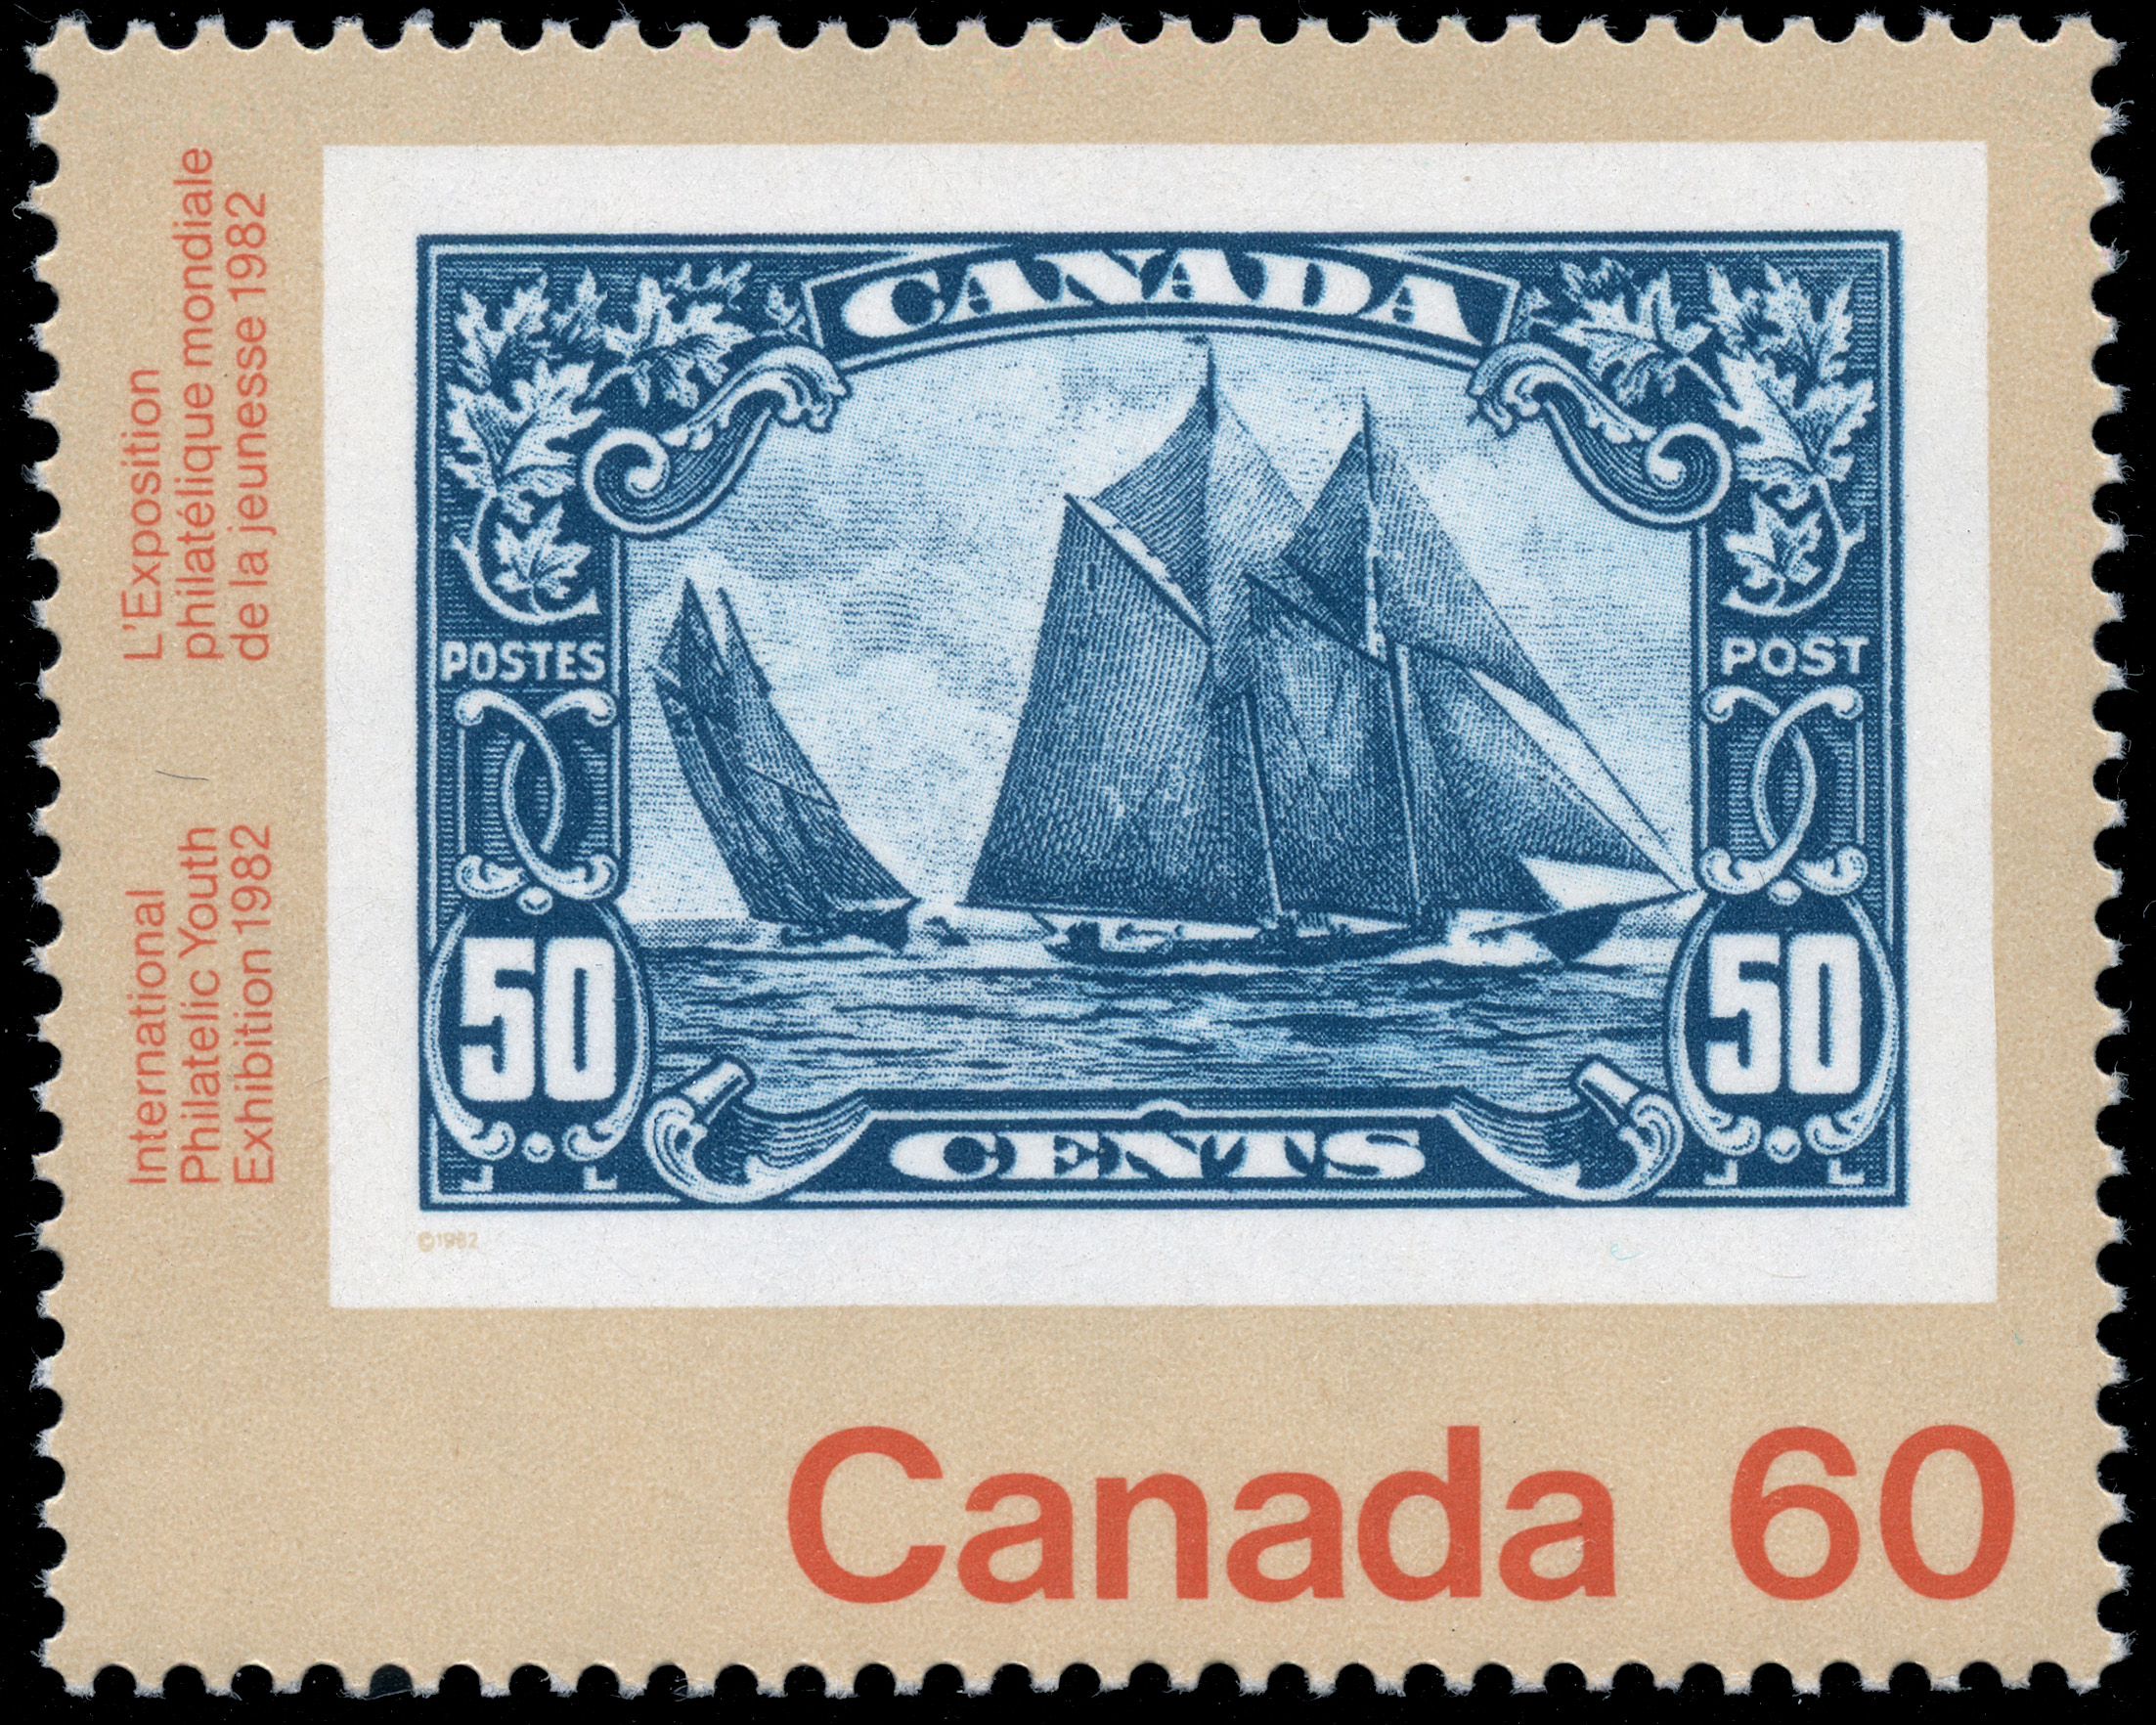 Bluenose, 1929 Canada Postage Stamp